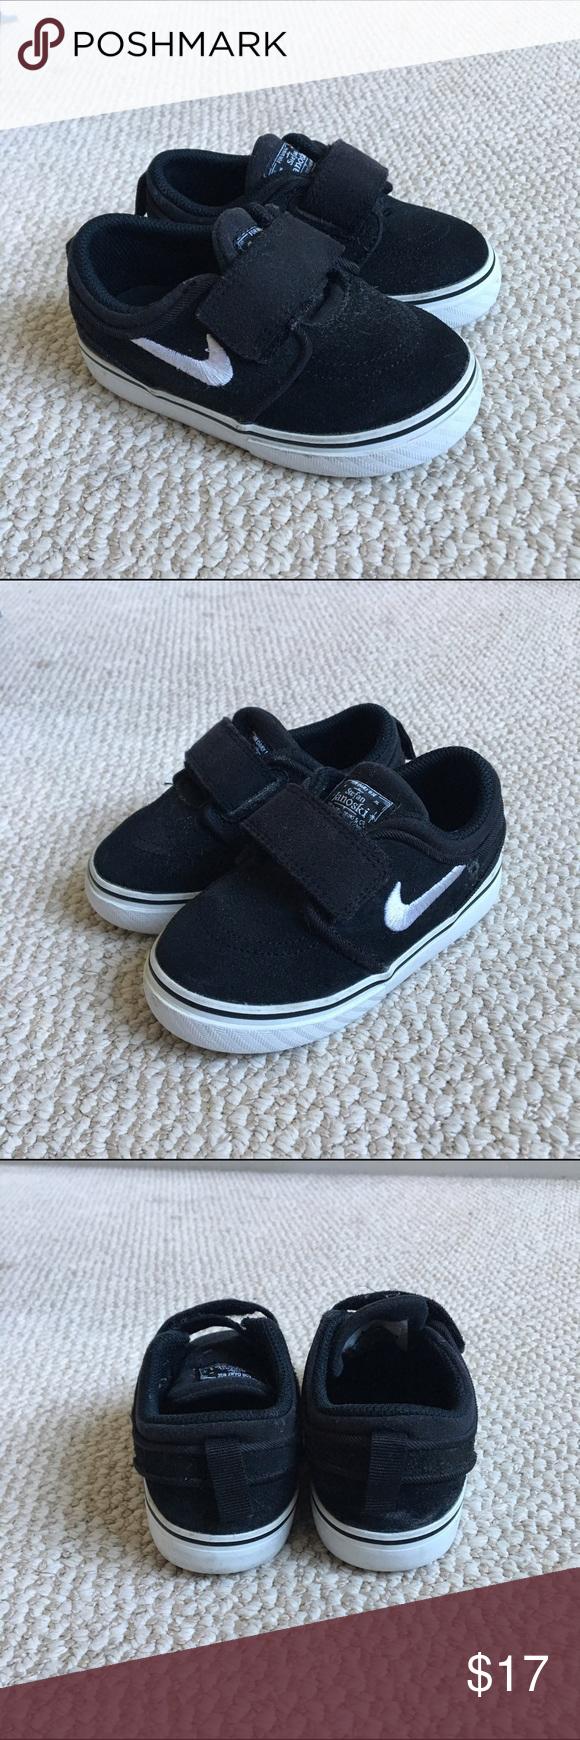 toddler Nike janoski size 6c